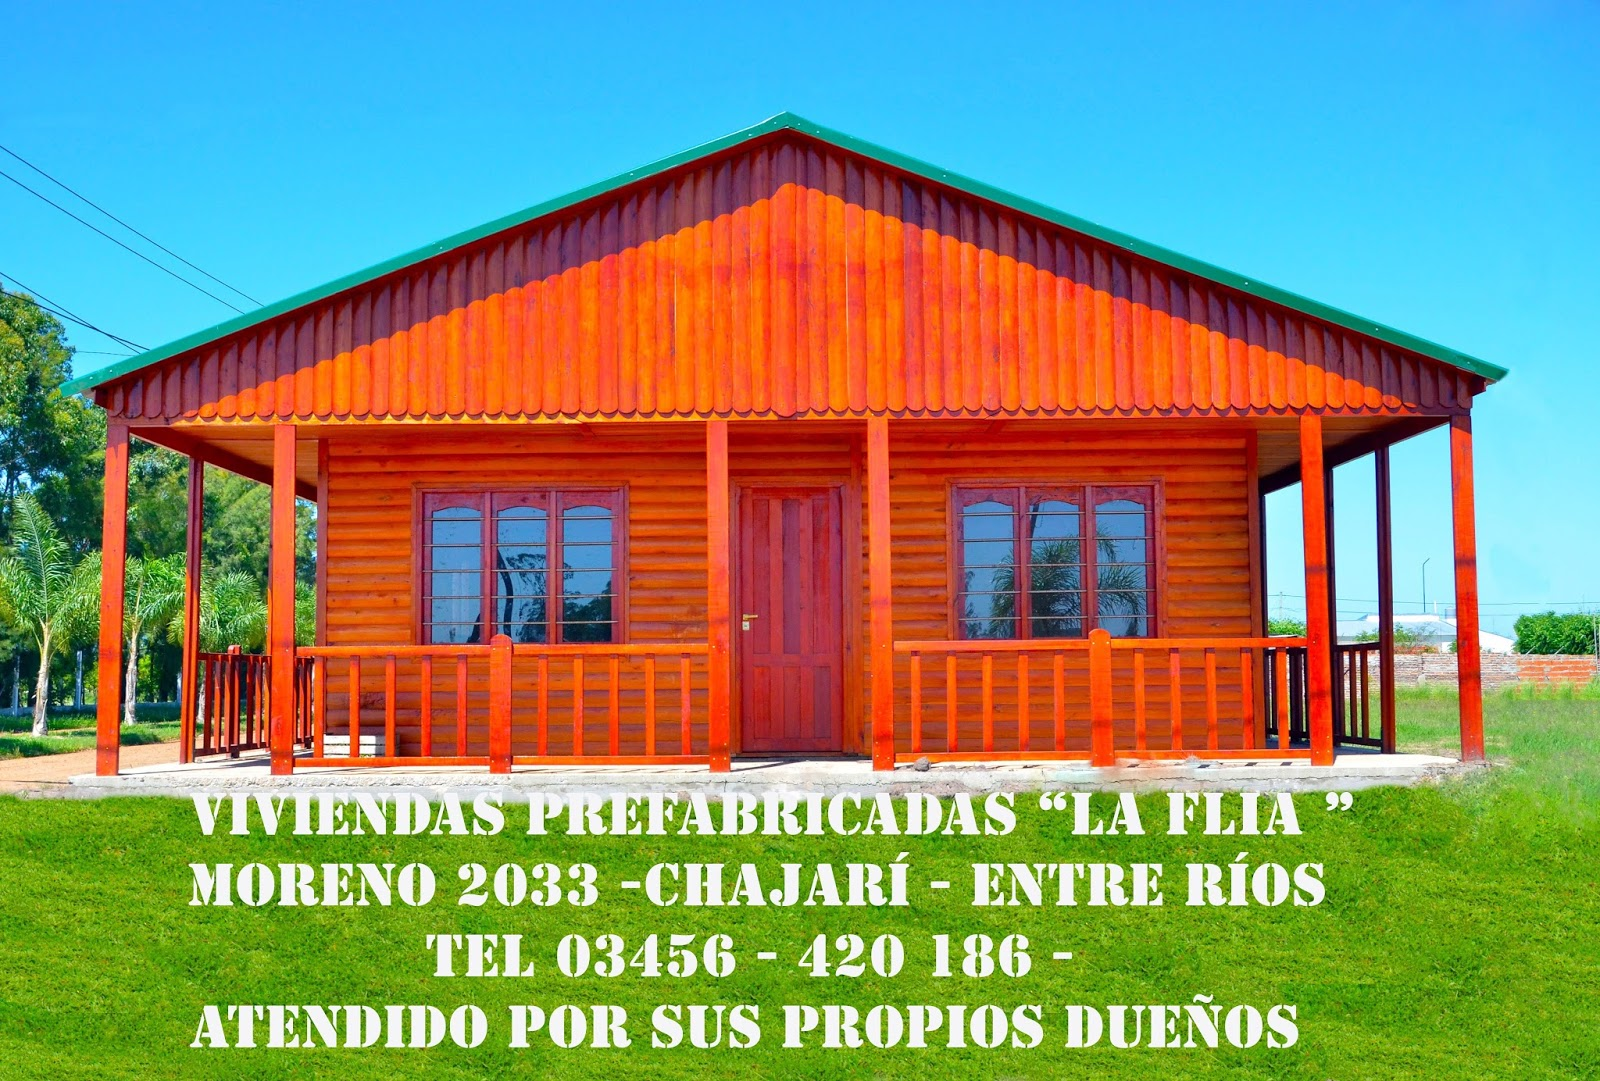 "viviendas prefabricadas ""la flia"" atendido por sus propios dueños"